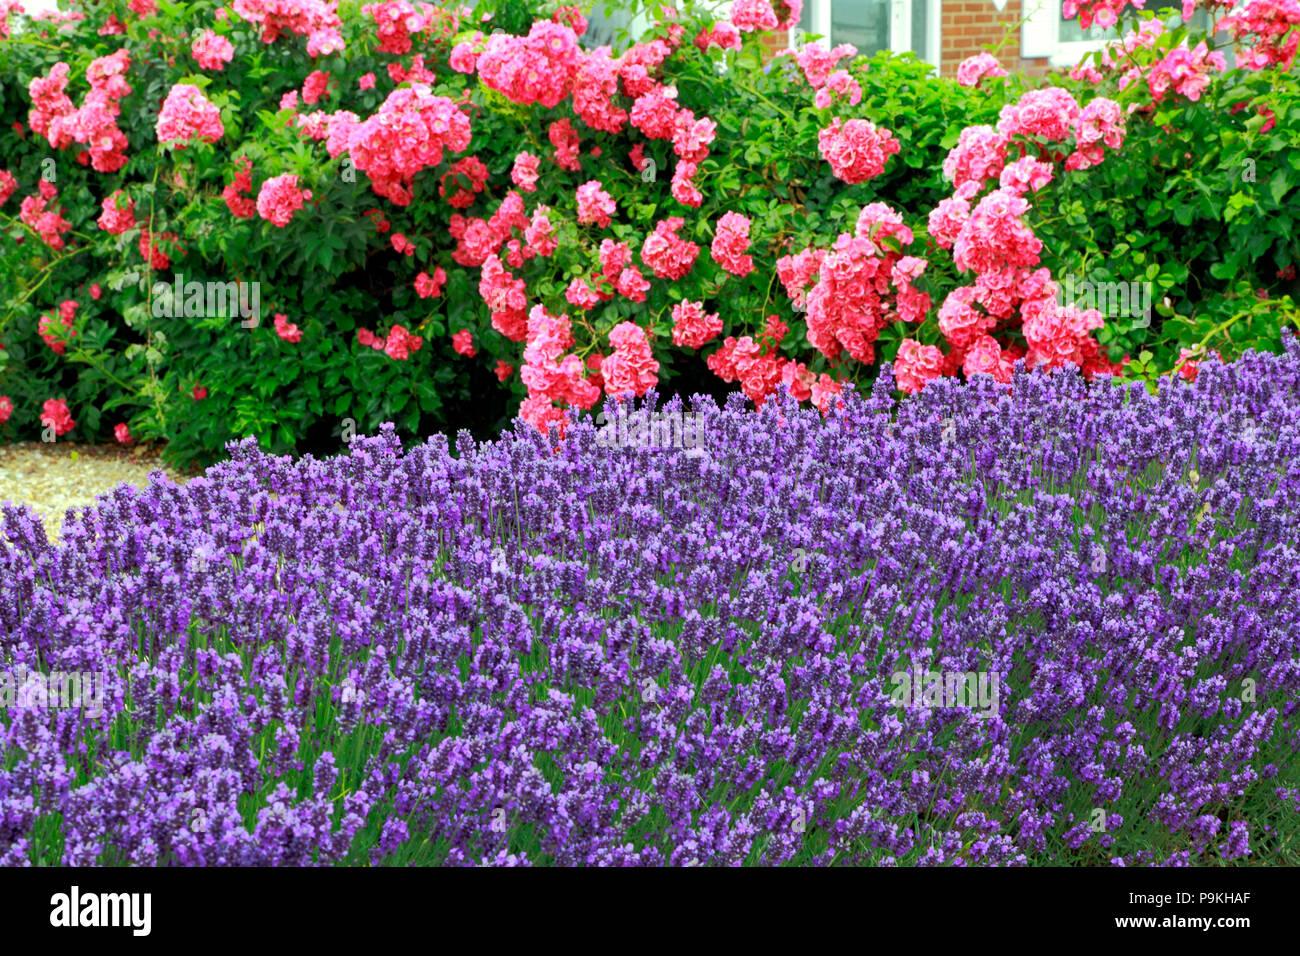 Fabelhaft Blau, Violett, Lavendel, Rosen, Garten, Wand, Lavandula, Rosa #NQ_75